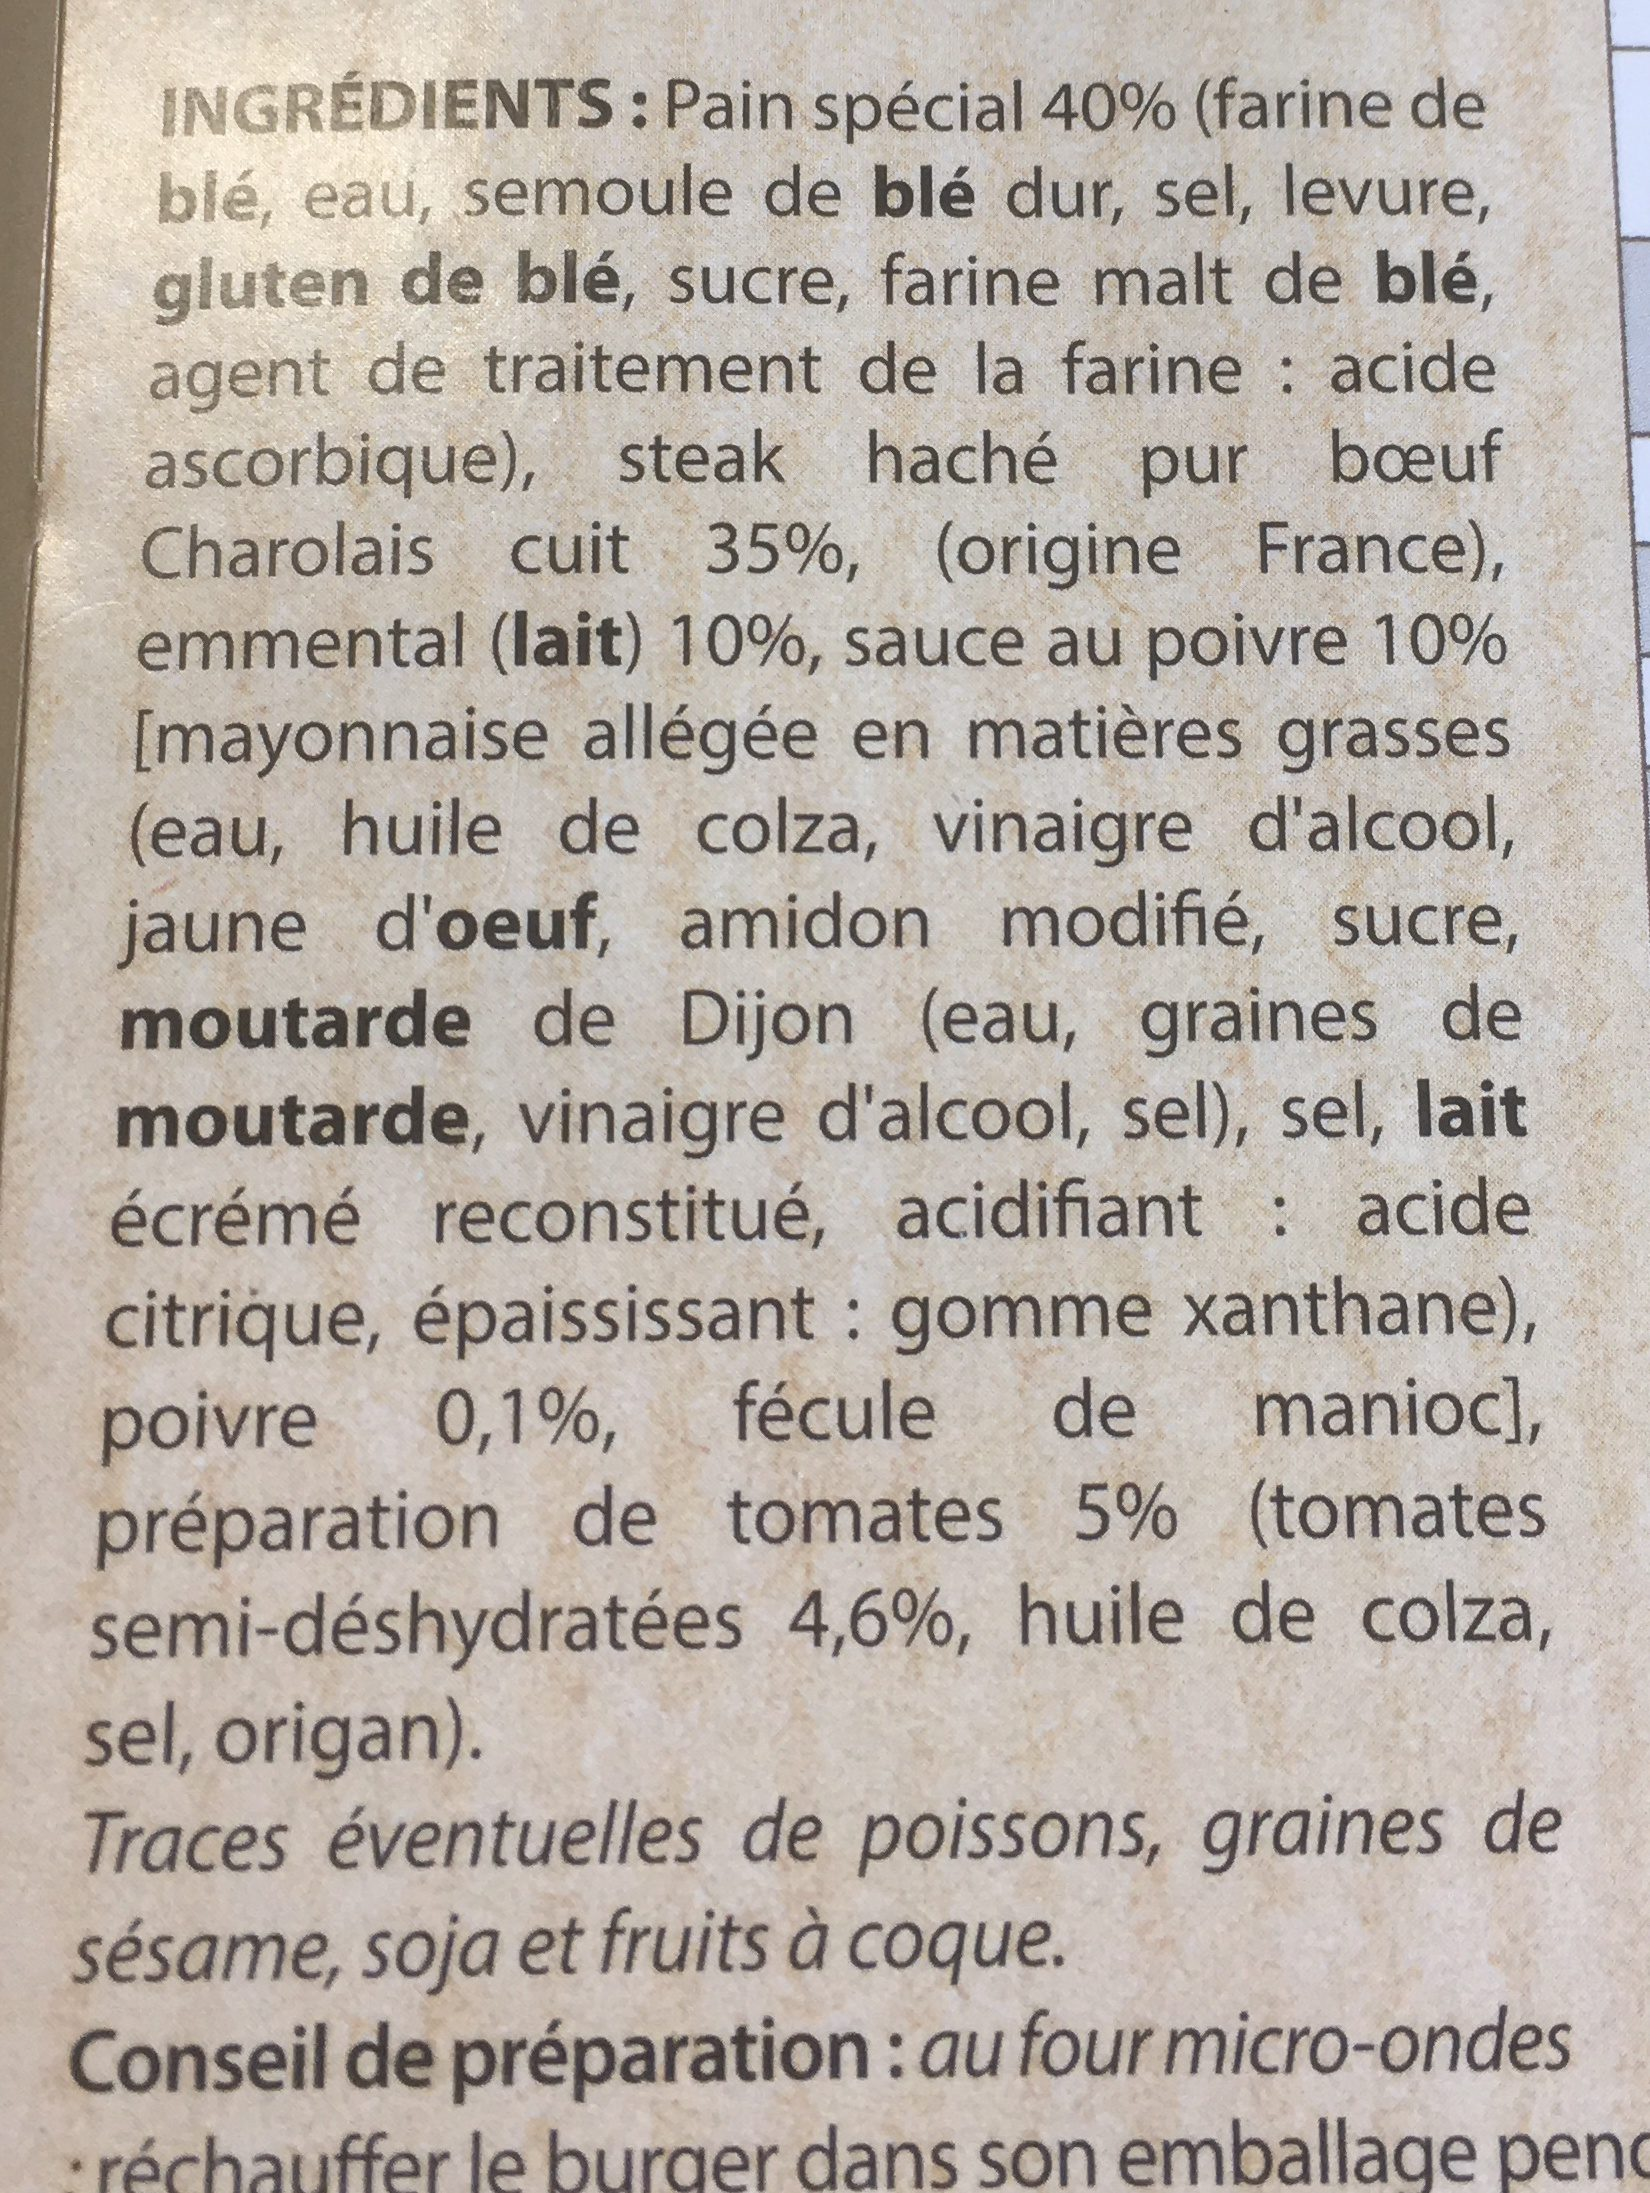 Maxi burger charolais - Ingrediënten